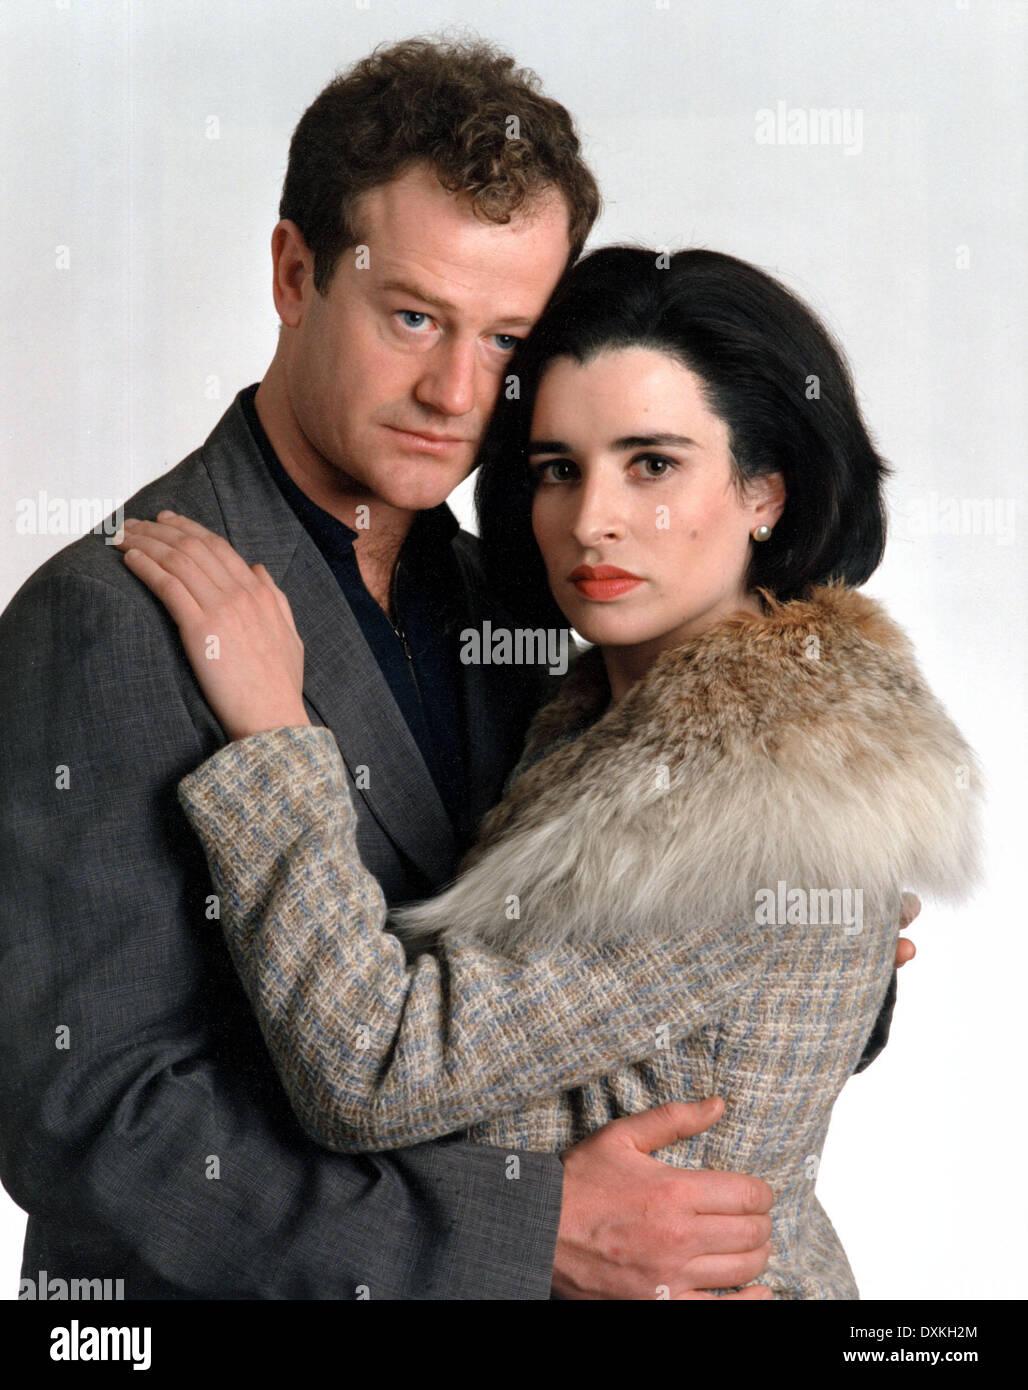 DANGEROUS LADY (UK TV 1995) OWEN TEALE, SUSAN LYNCH - Stock Image